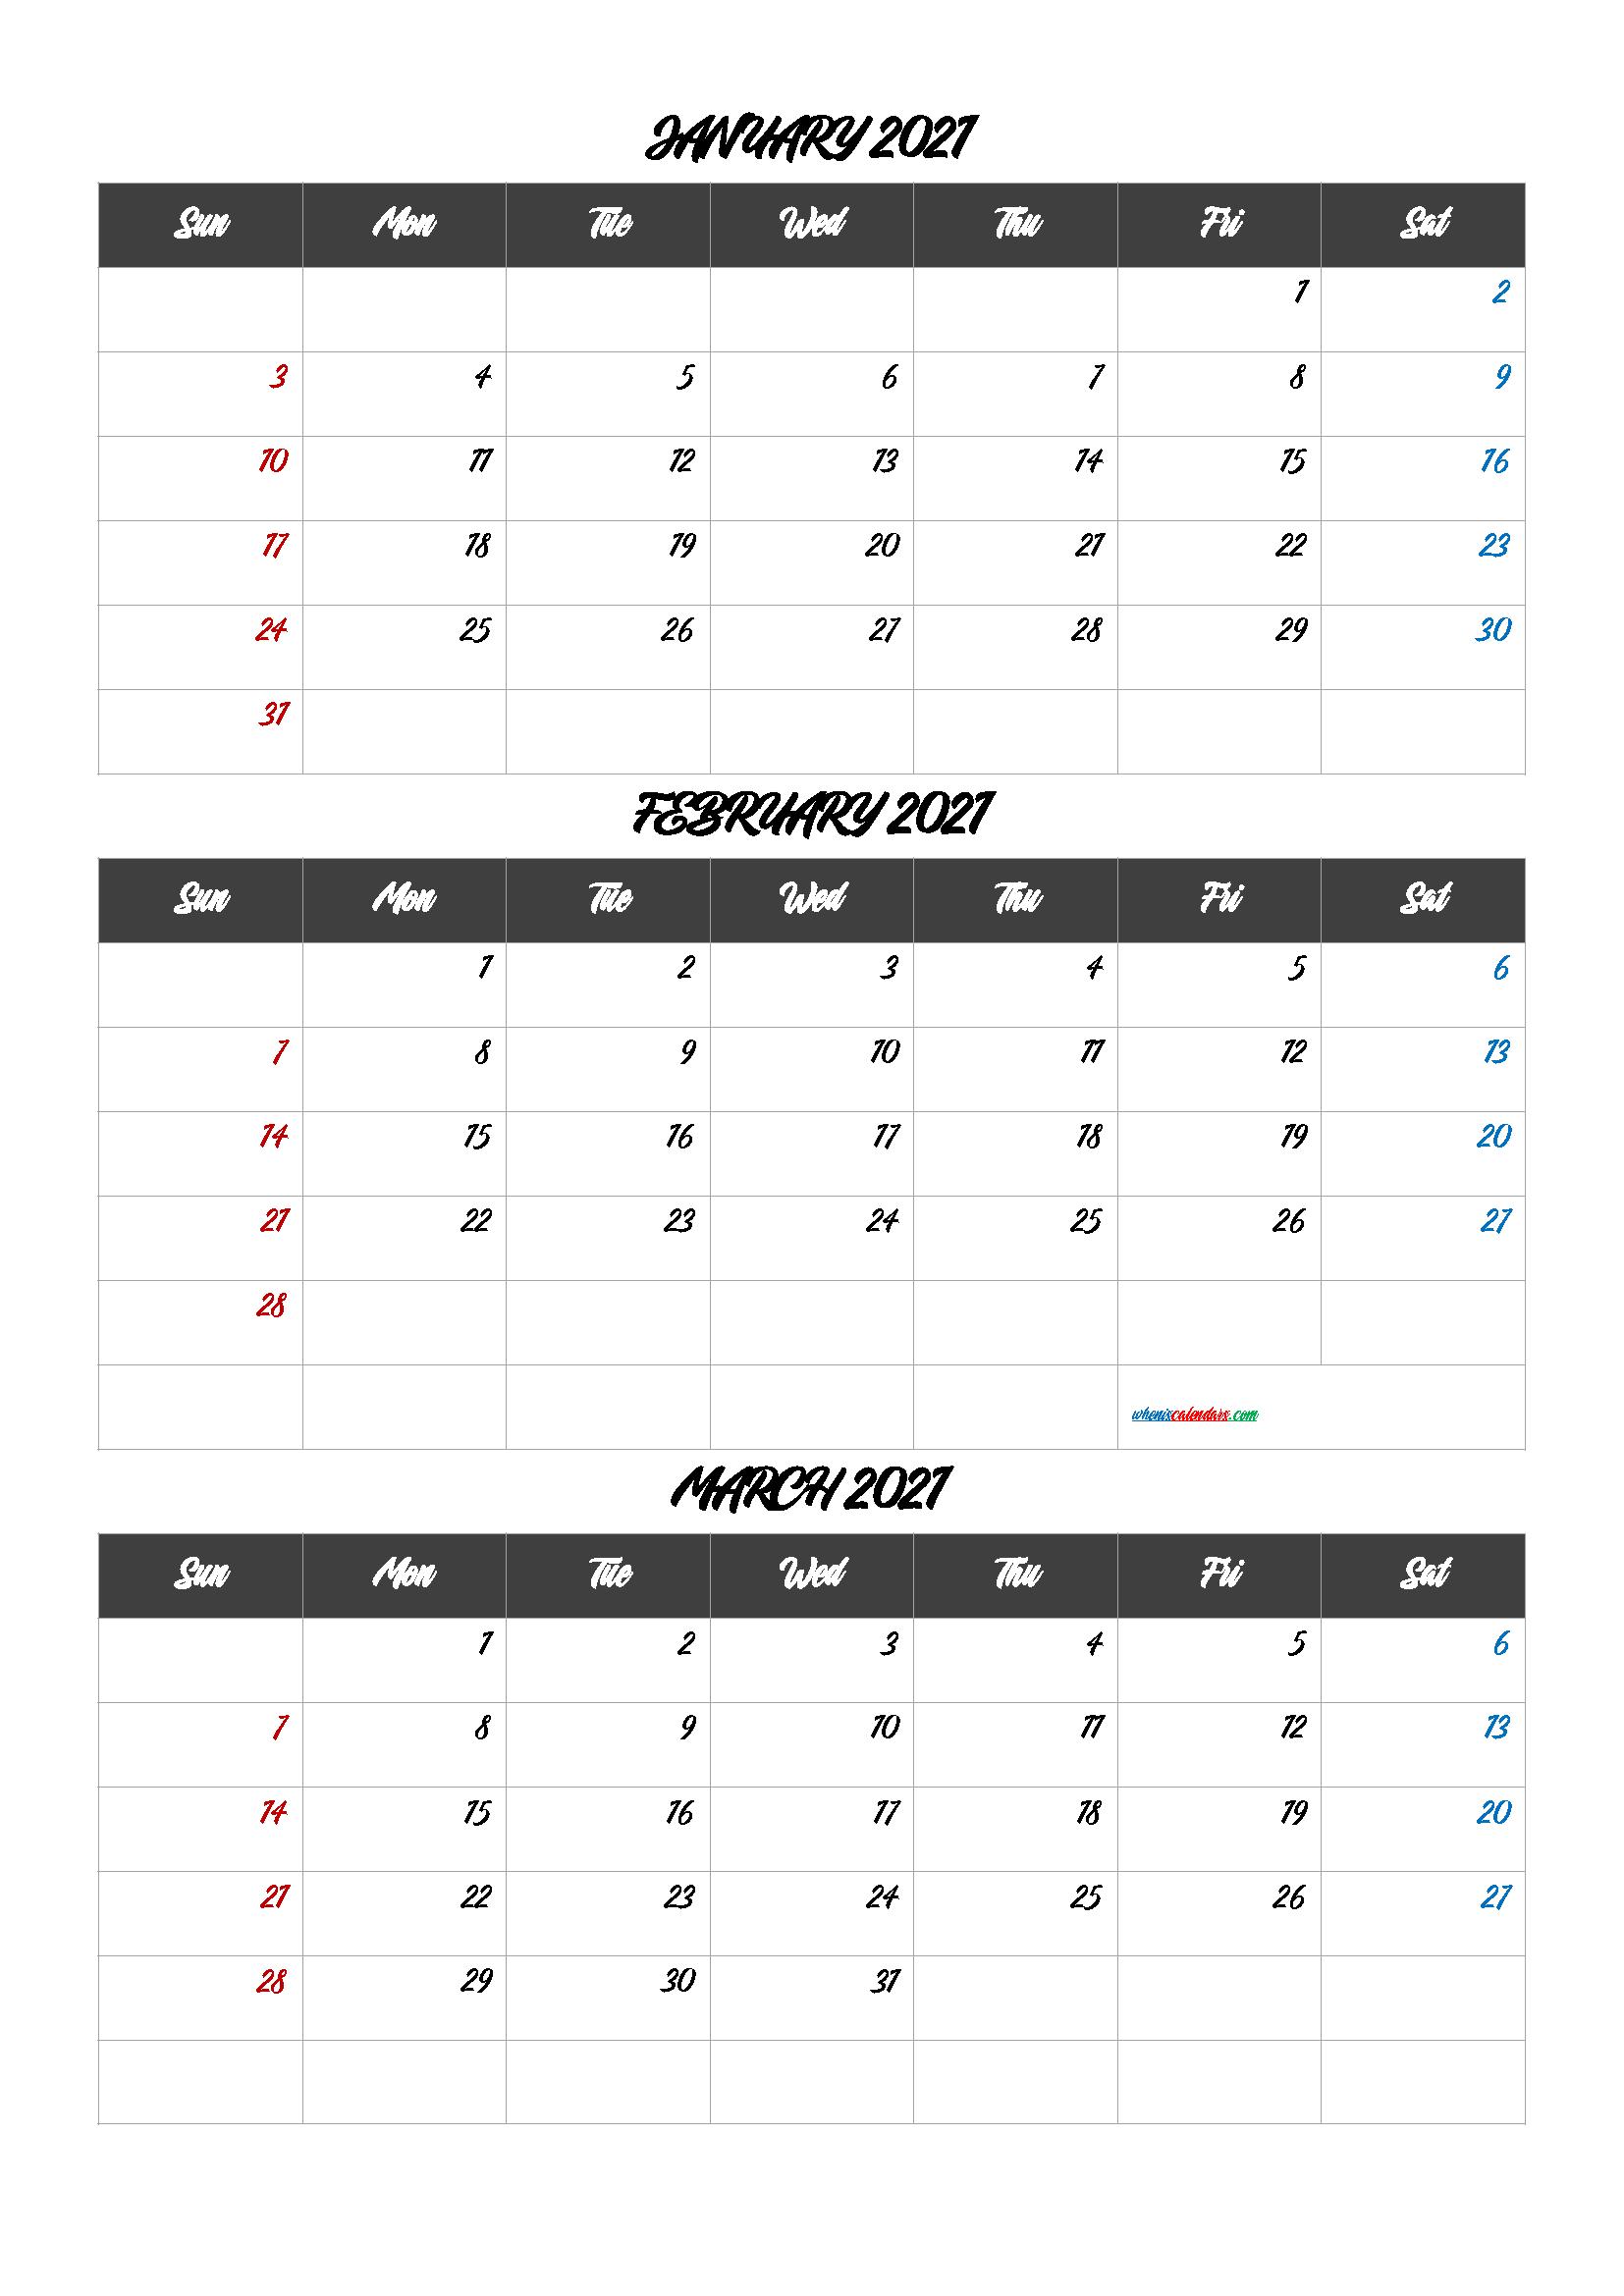 Calendar January February March 2021 [Q1 Q2 Q3 Q4] Intended For January February March 2021 Calendar